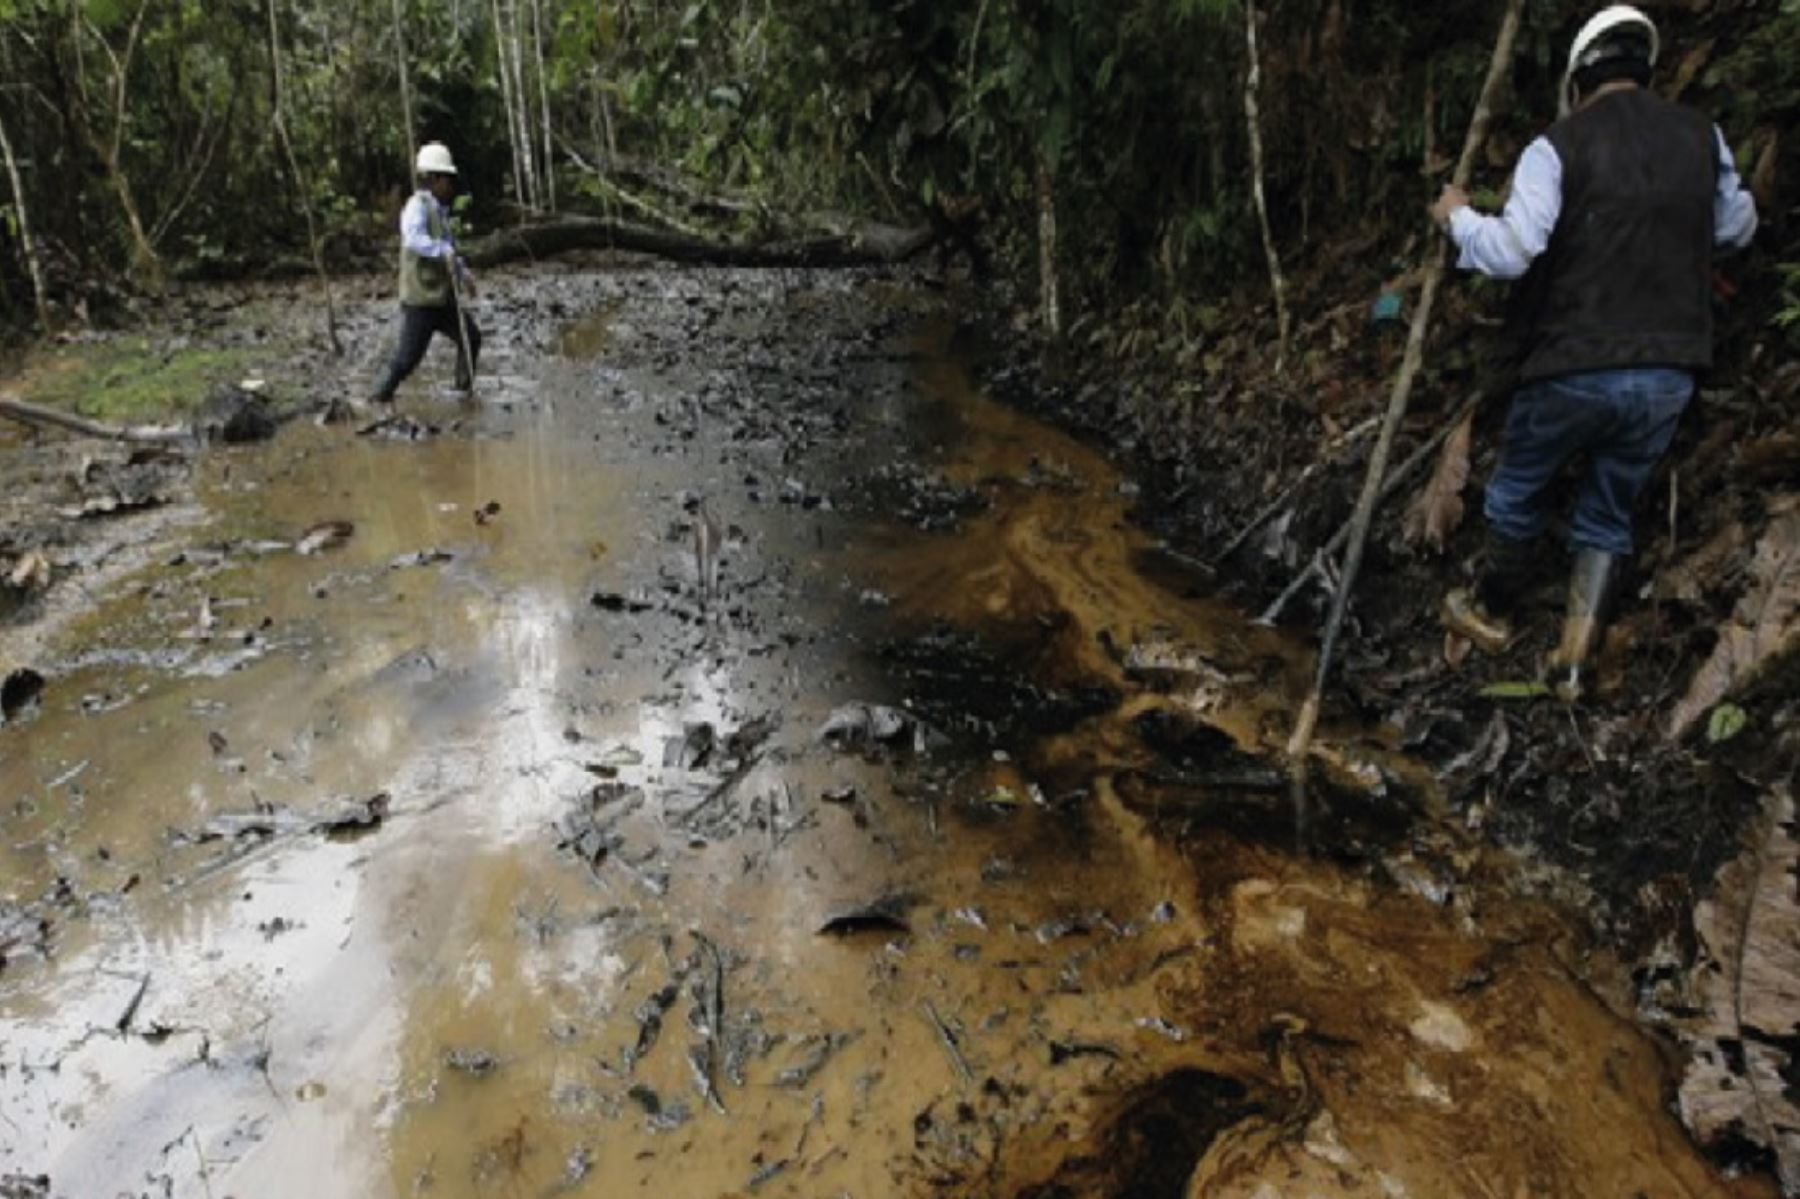 Osinergmin investiga las causas del derrame de petróleo para determinar responsabilidades.